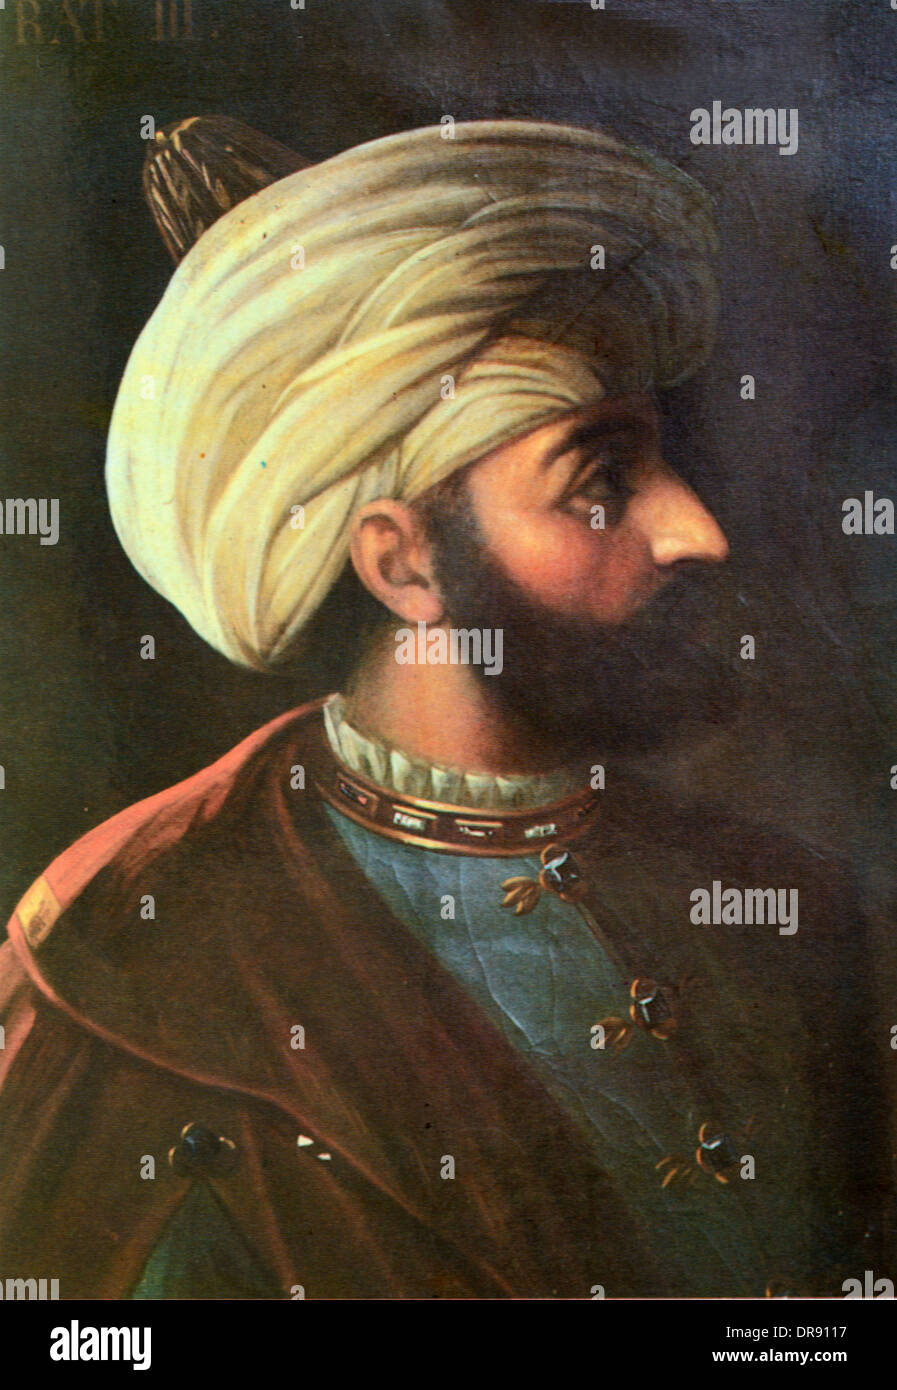 Turkish Ottoman Sultan Murad III (1546-1595) or Murat III Portrait Painting - Stock Image